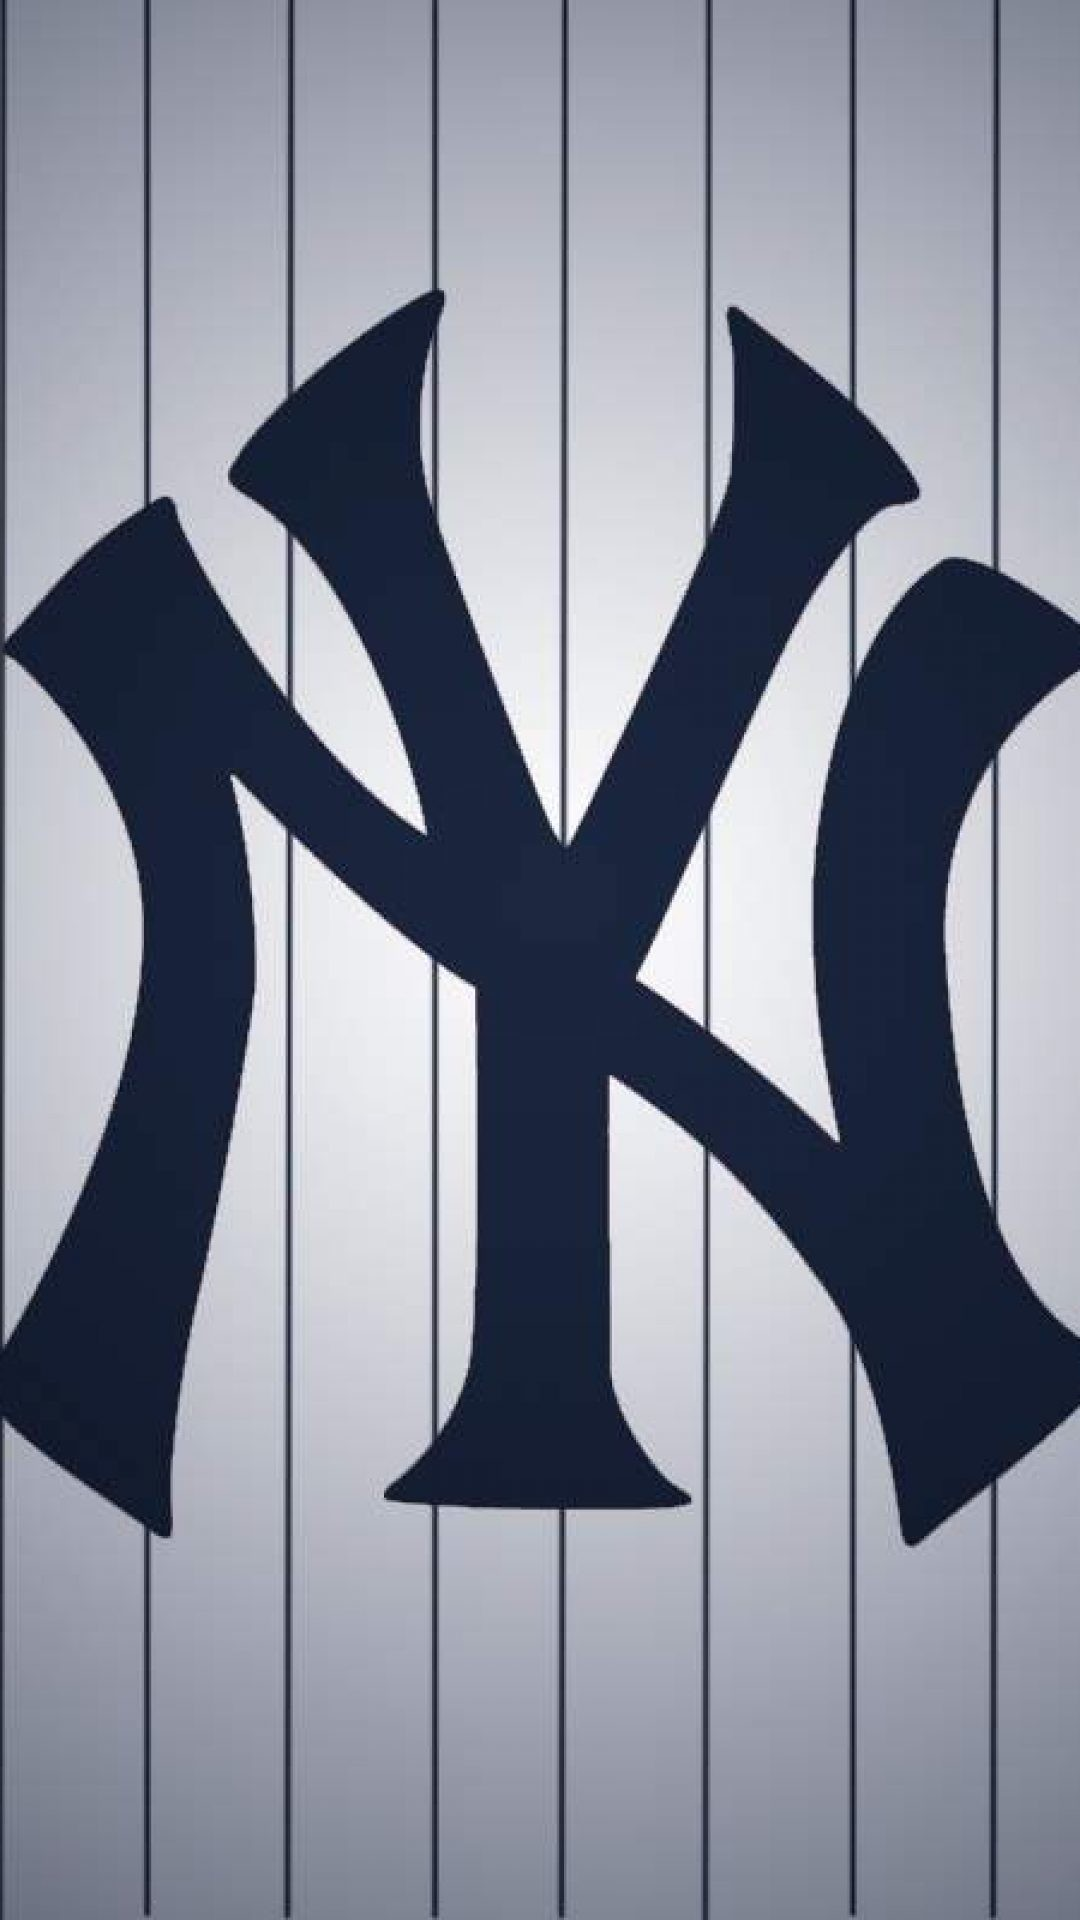 Mlb Iphone Wallpaper New York Yankees Iphone Wallpaper 67 Images